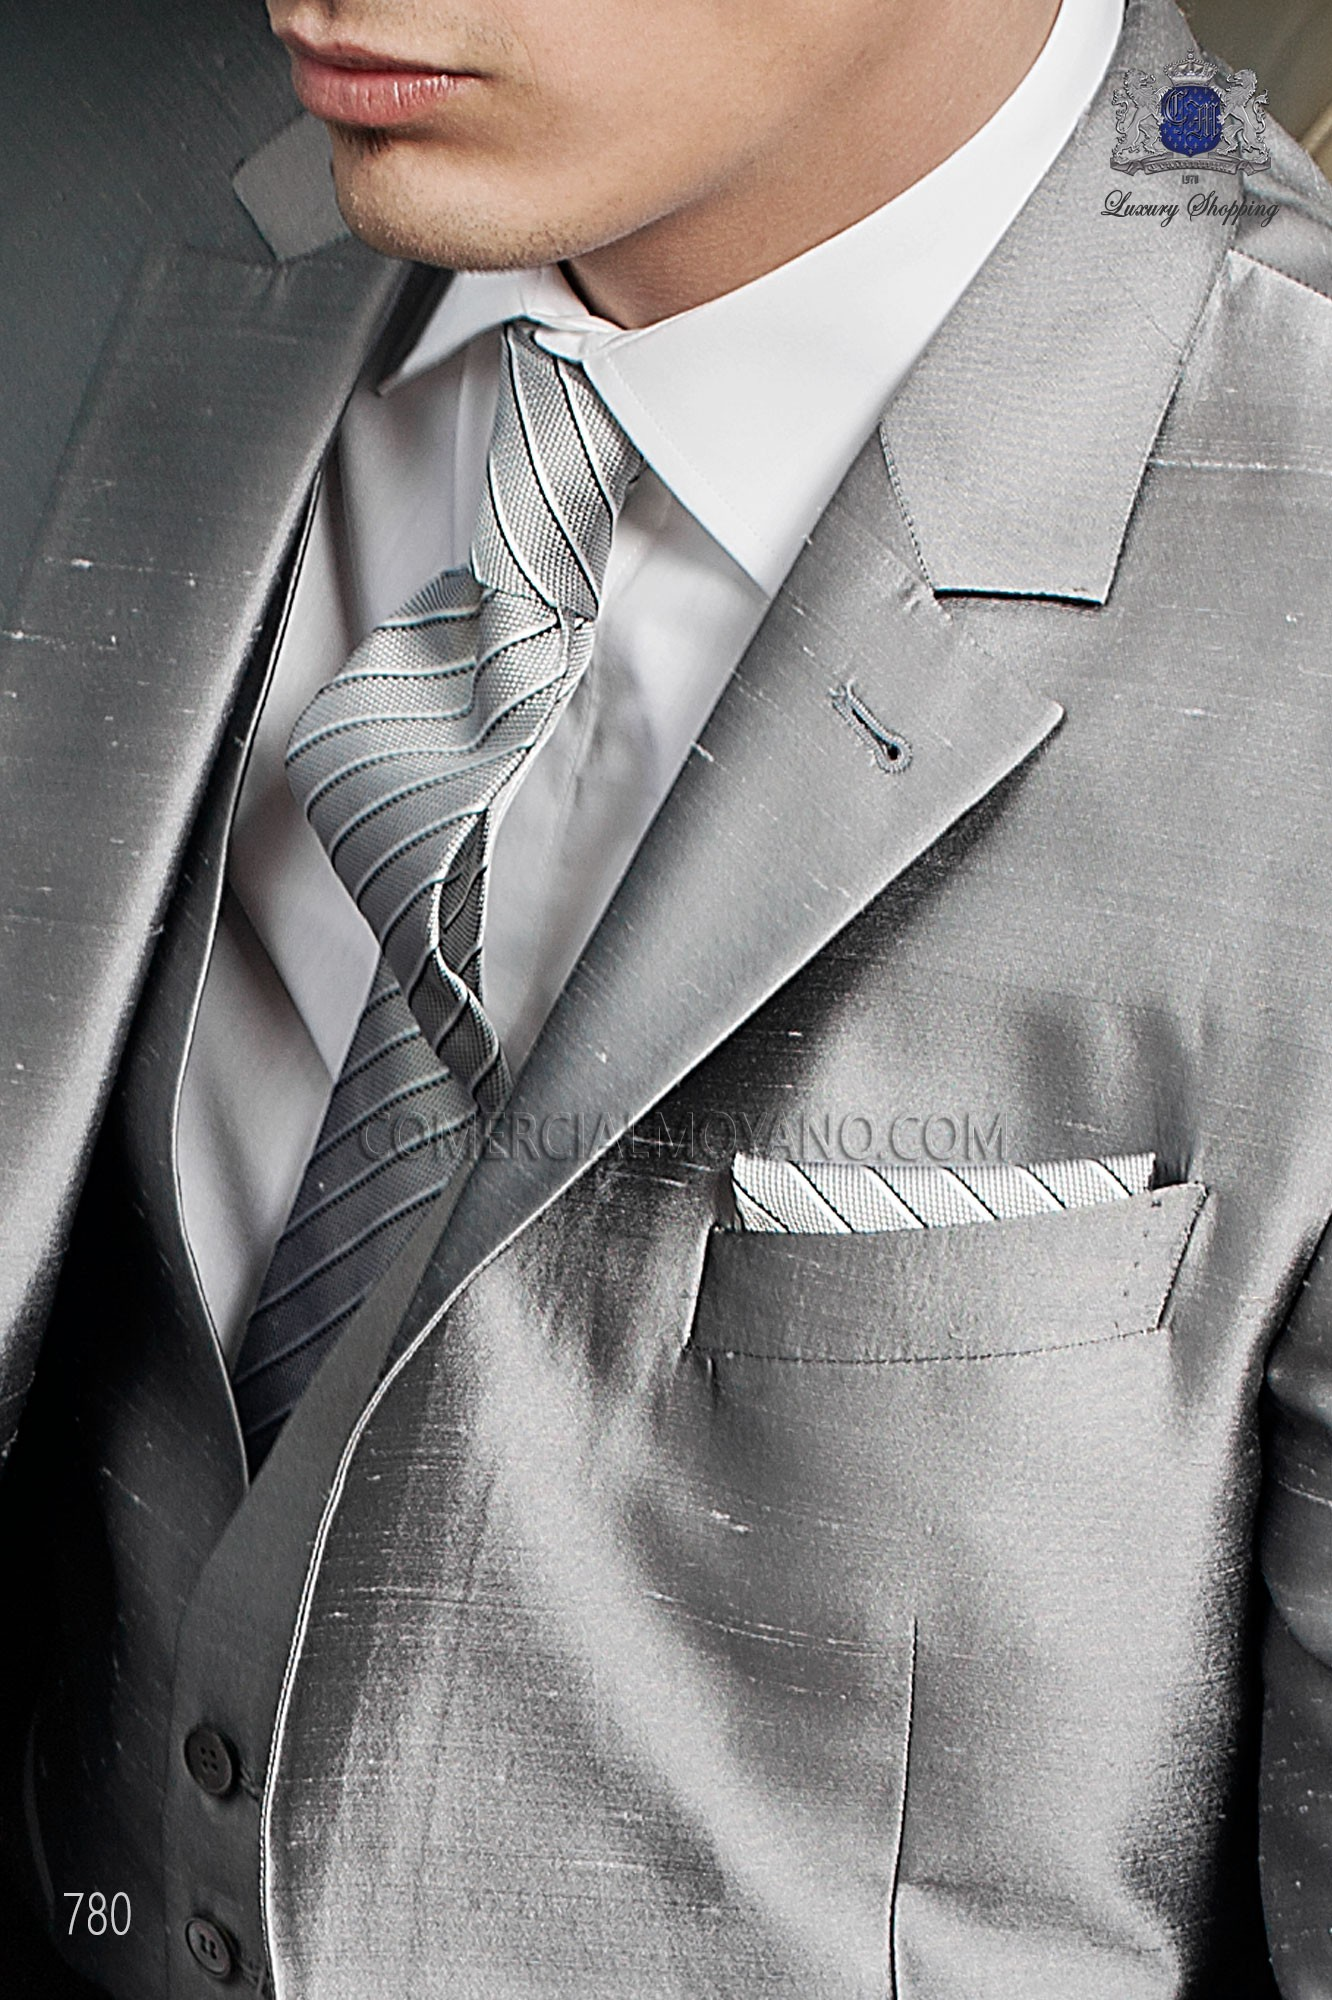 Italian fashion gray men wedding suit, model: 780 Ottavio Nuccio Gala Fashion Collection